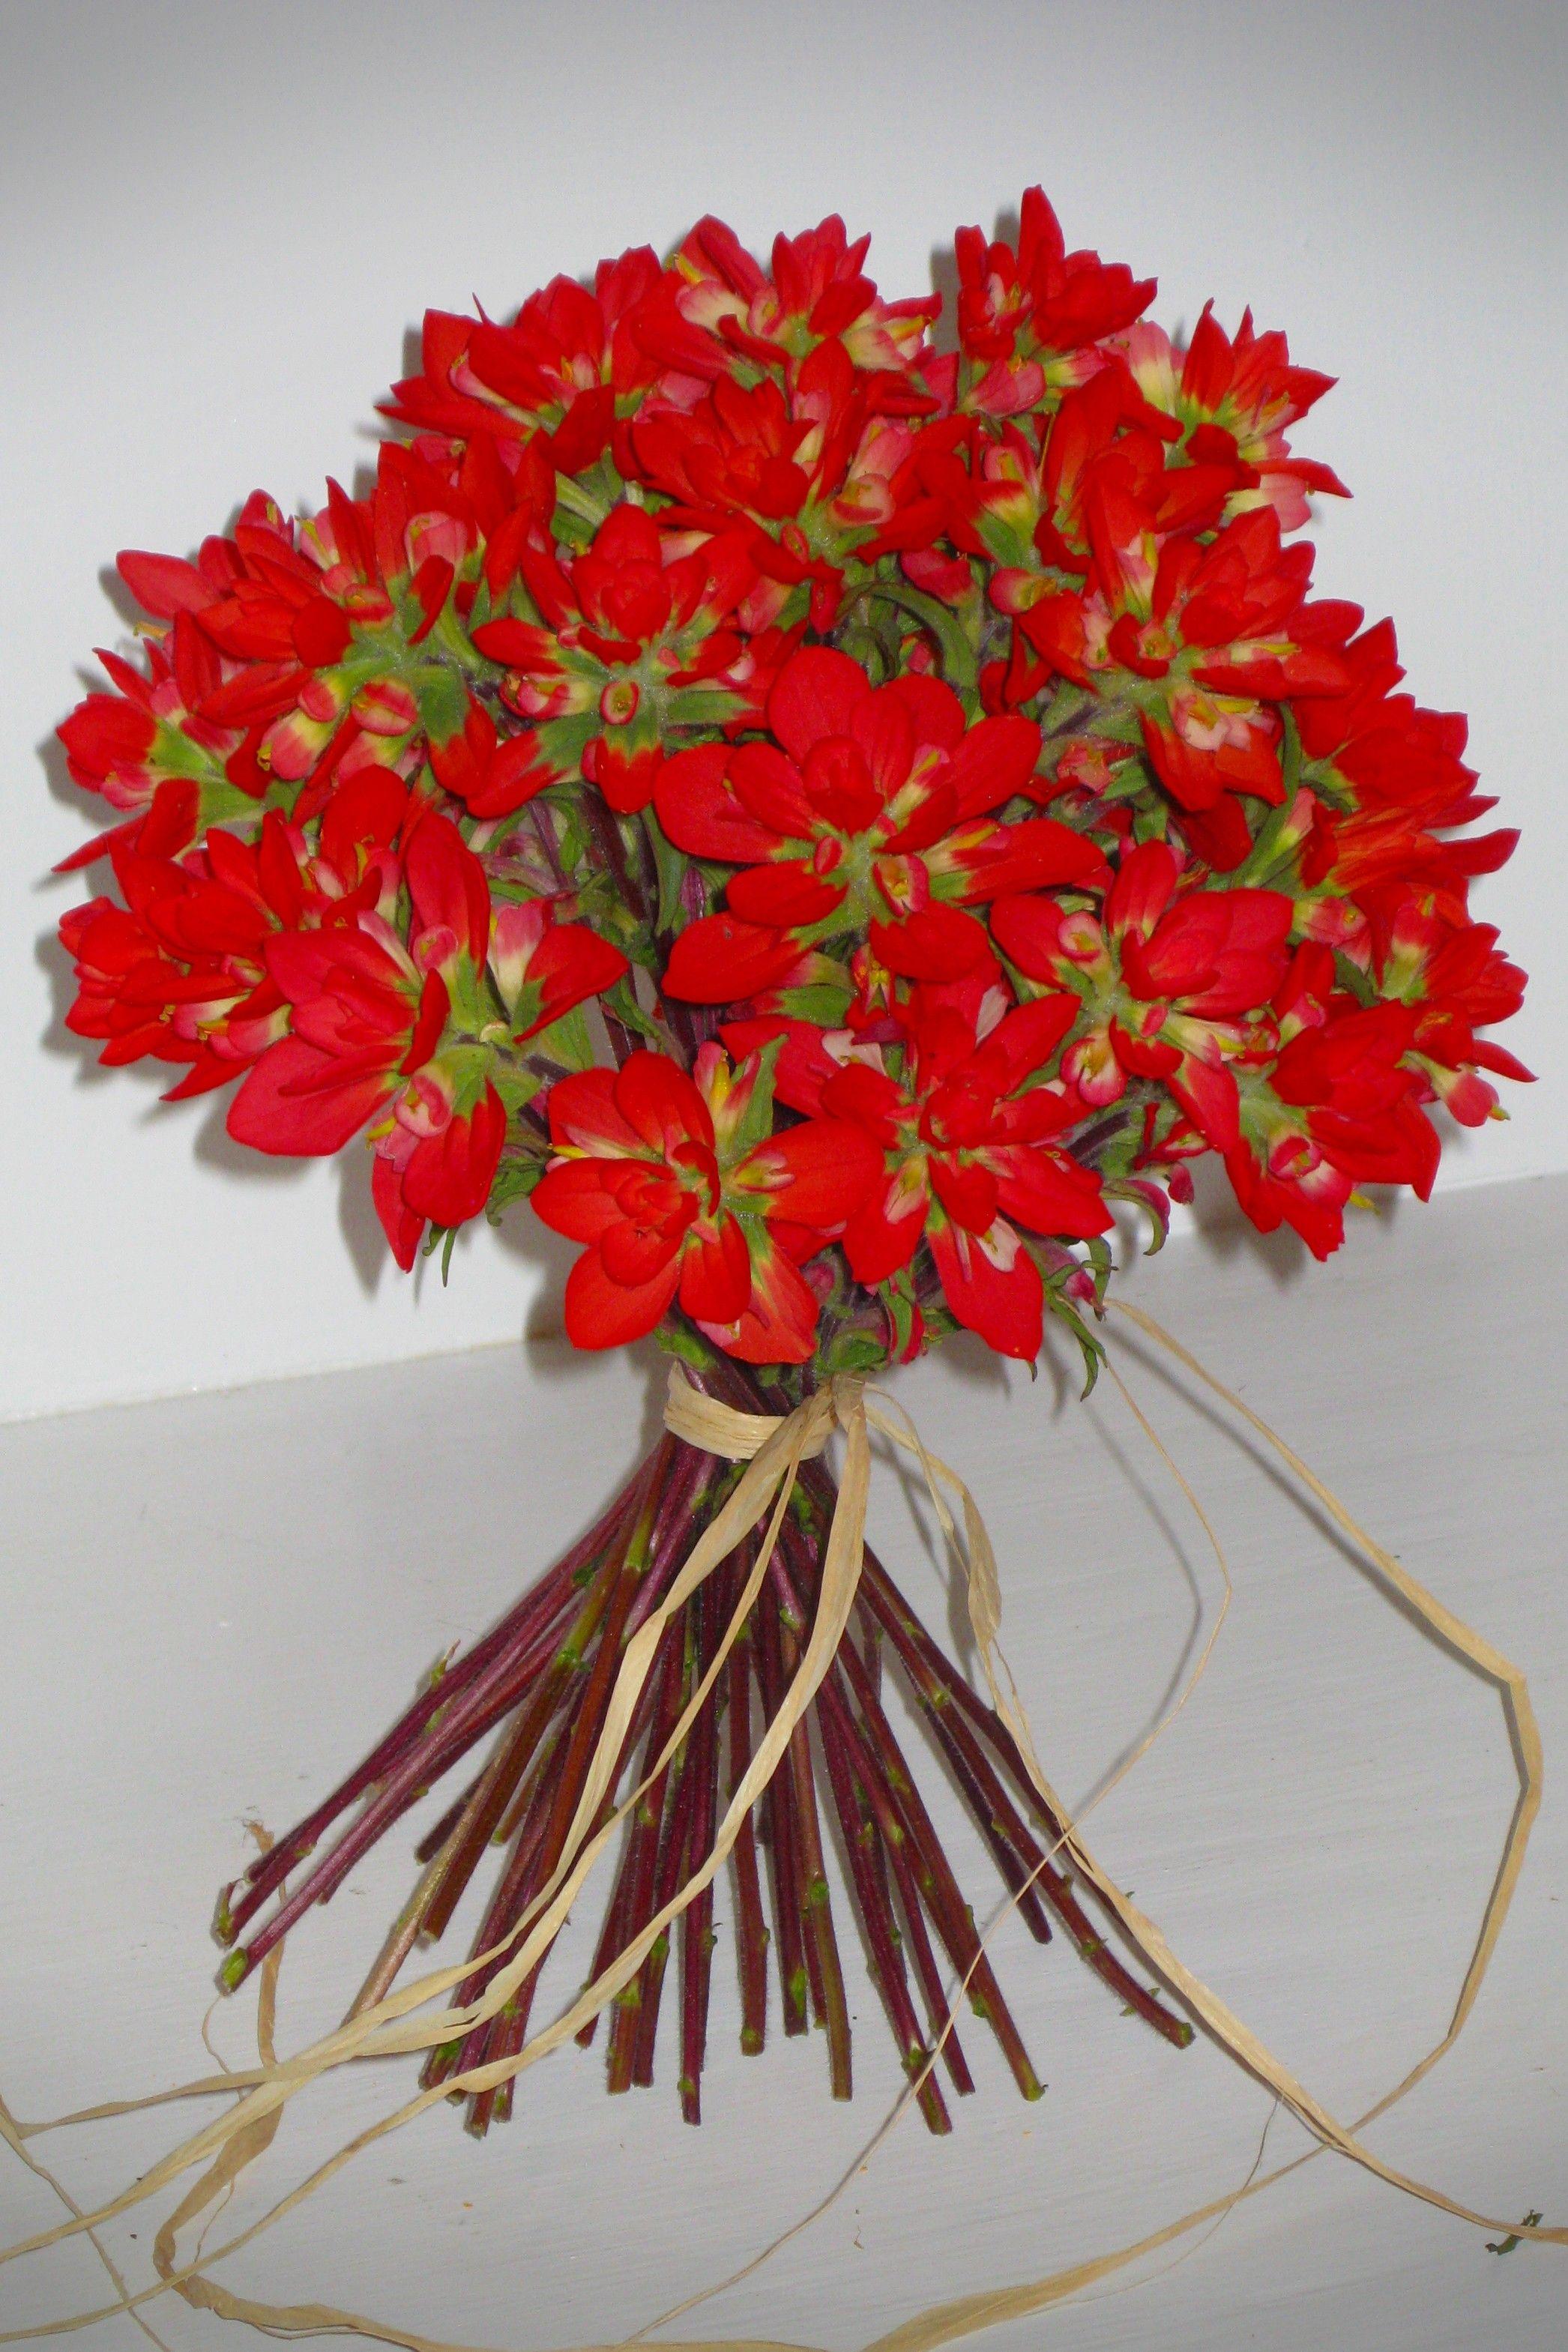 My Favorite Flower Indian Paintbrush Bridal Bouquet